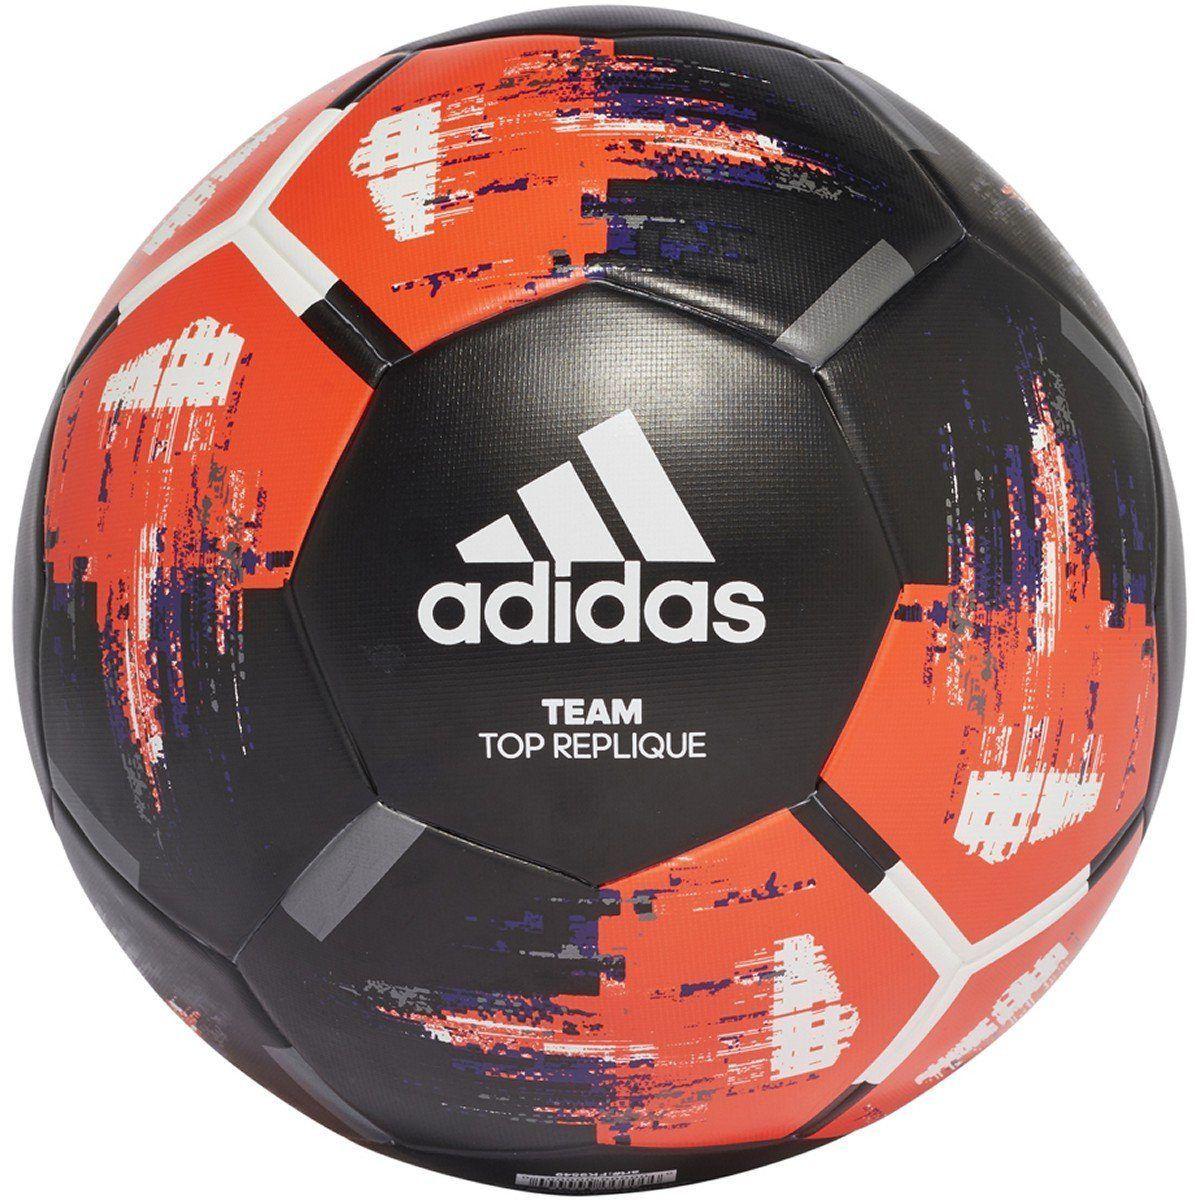 Adidas Team Top Replique Soccer Ball FK9549 in 2020